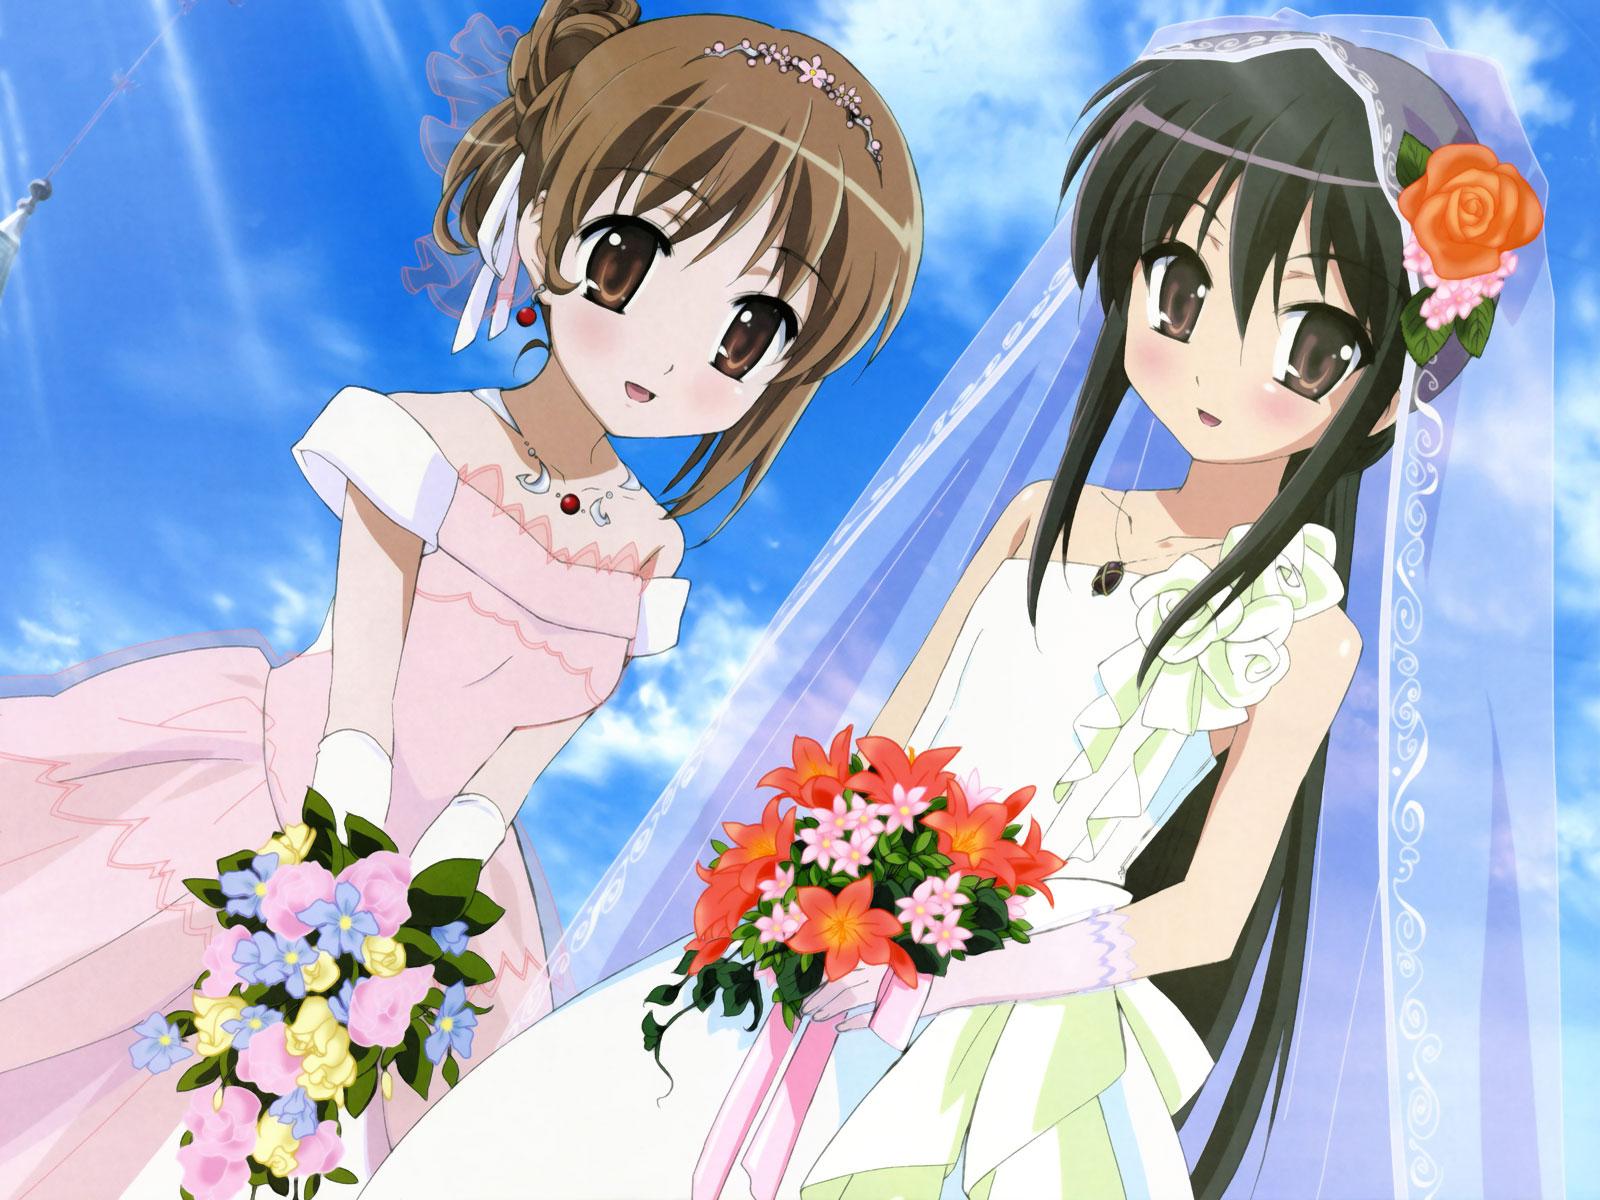 Shakugan no Shana, аниме, девушки, рисованное 1024х768 - Обои для